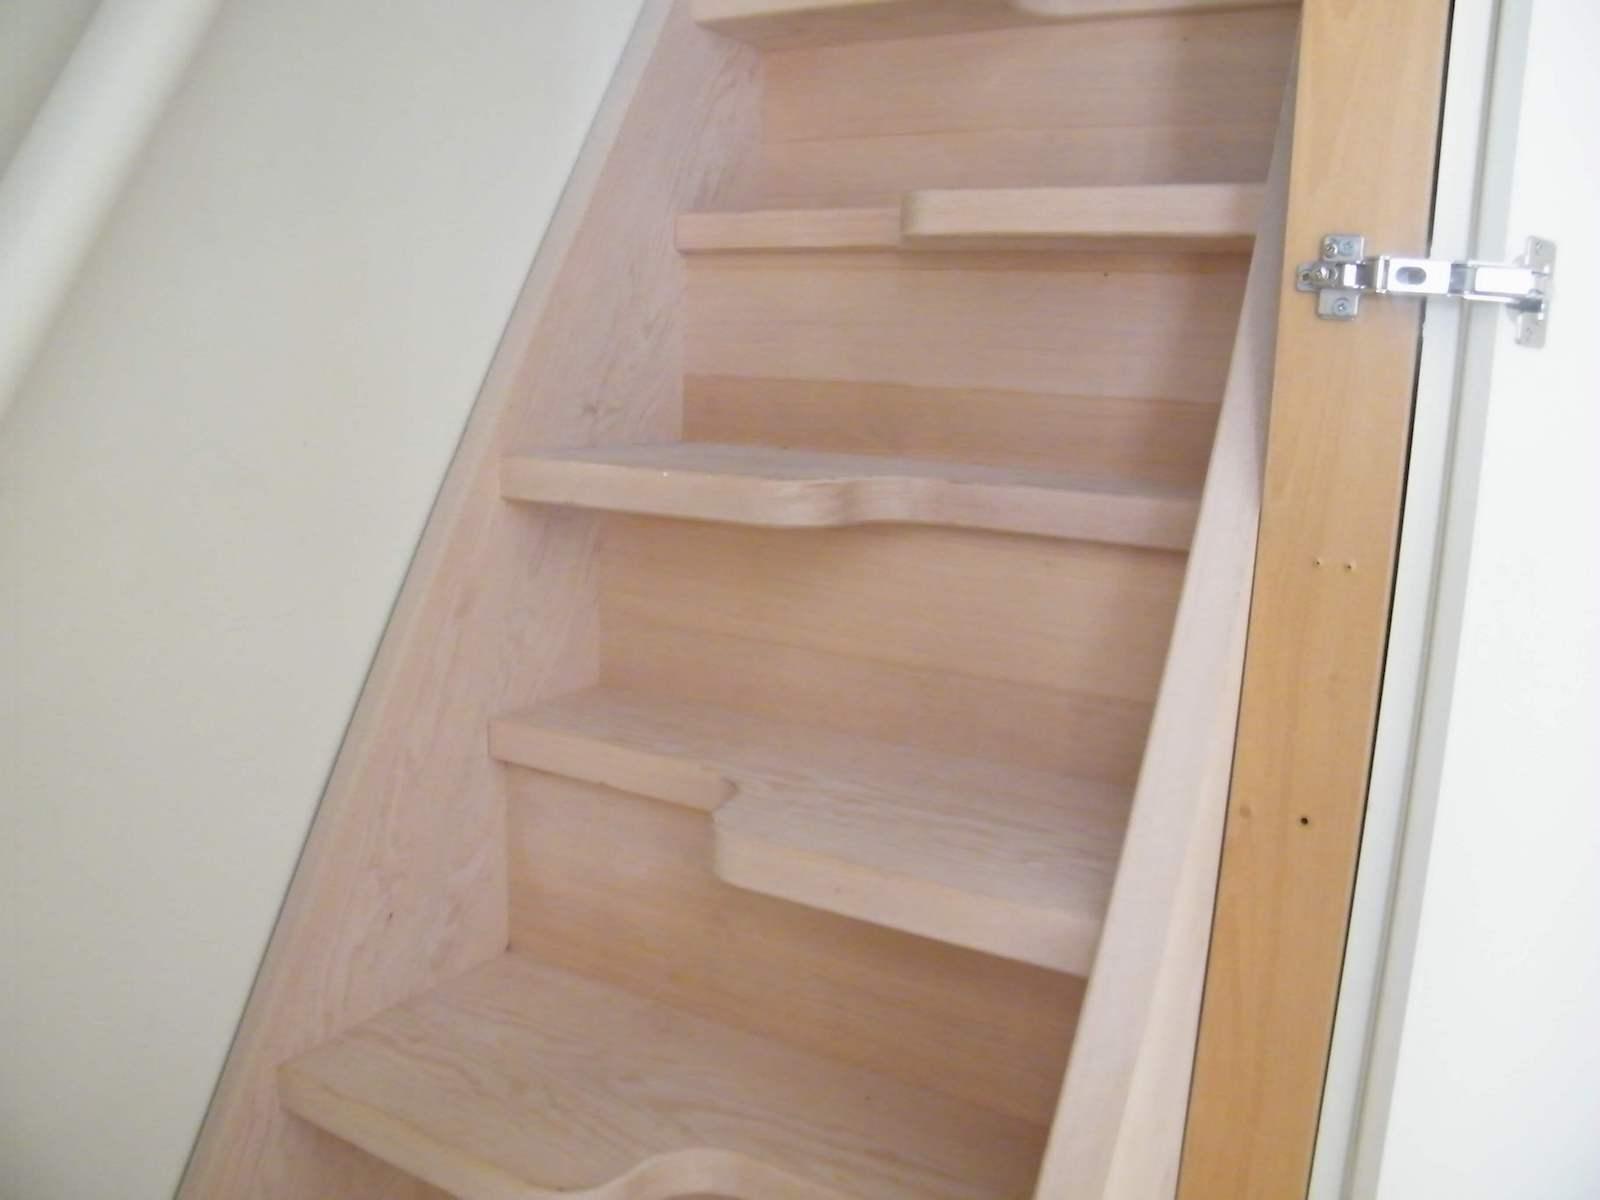 Hemlock paddle staircase